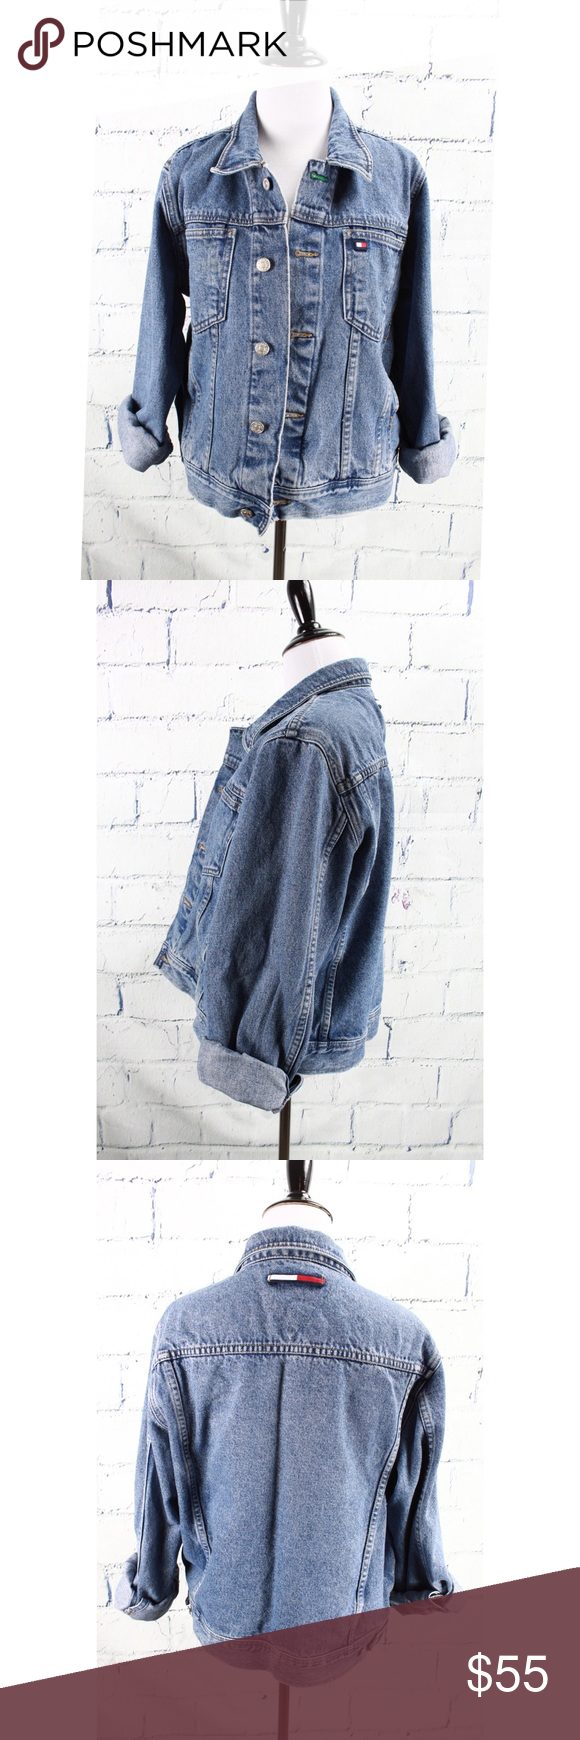 Tommy Hilfiger Women S Denim Jacket Jean Sz Lg Denim Jacket Women Clothes Design Denim Jacket [ 1740 x 580 Pixel ]